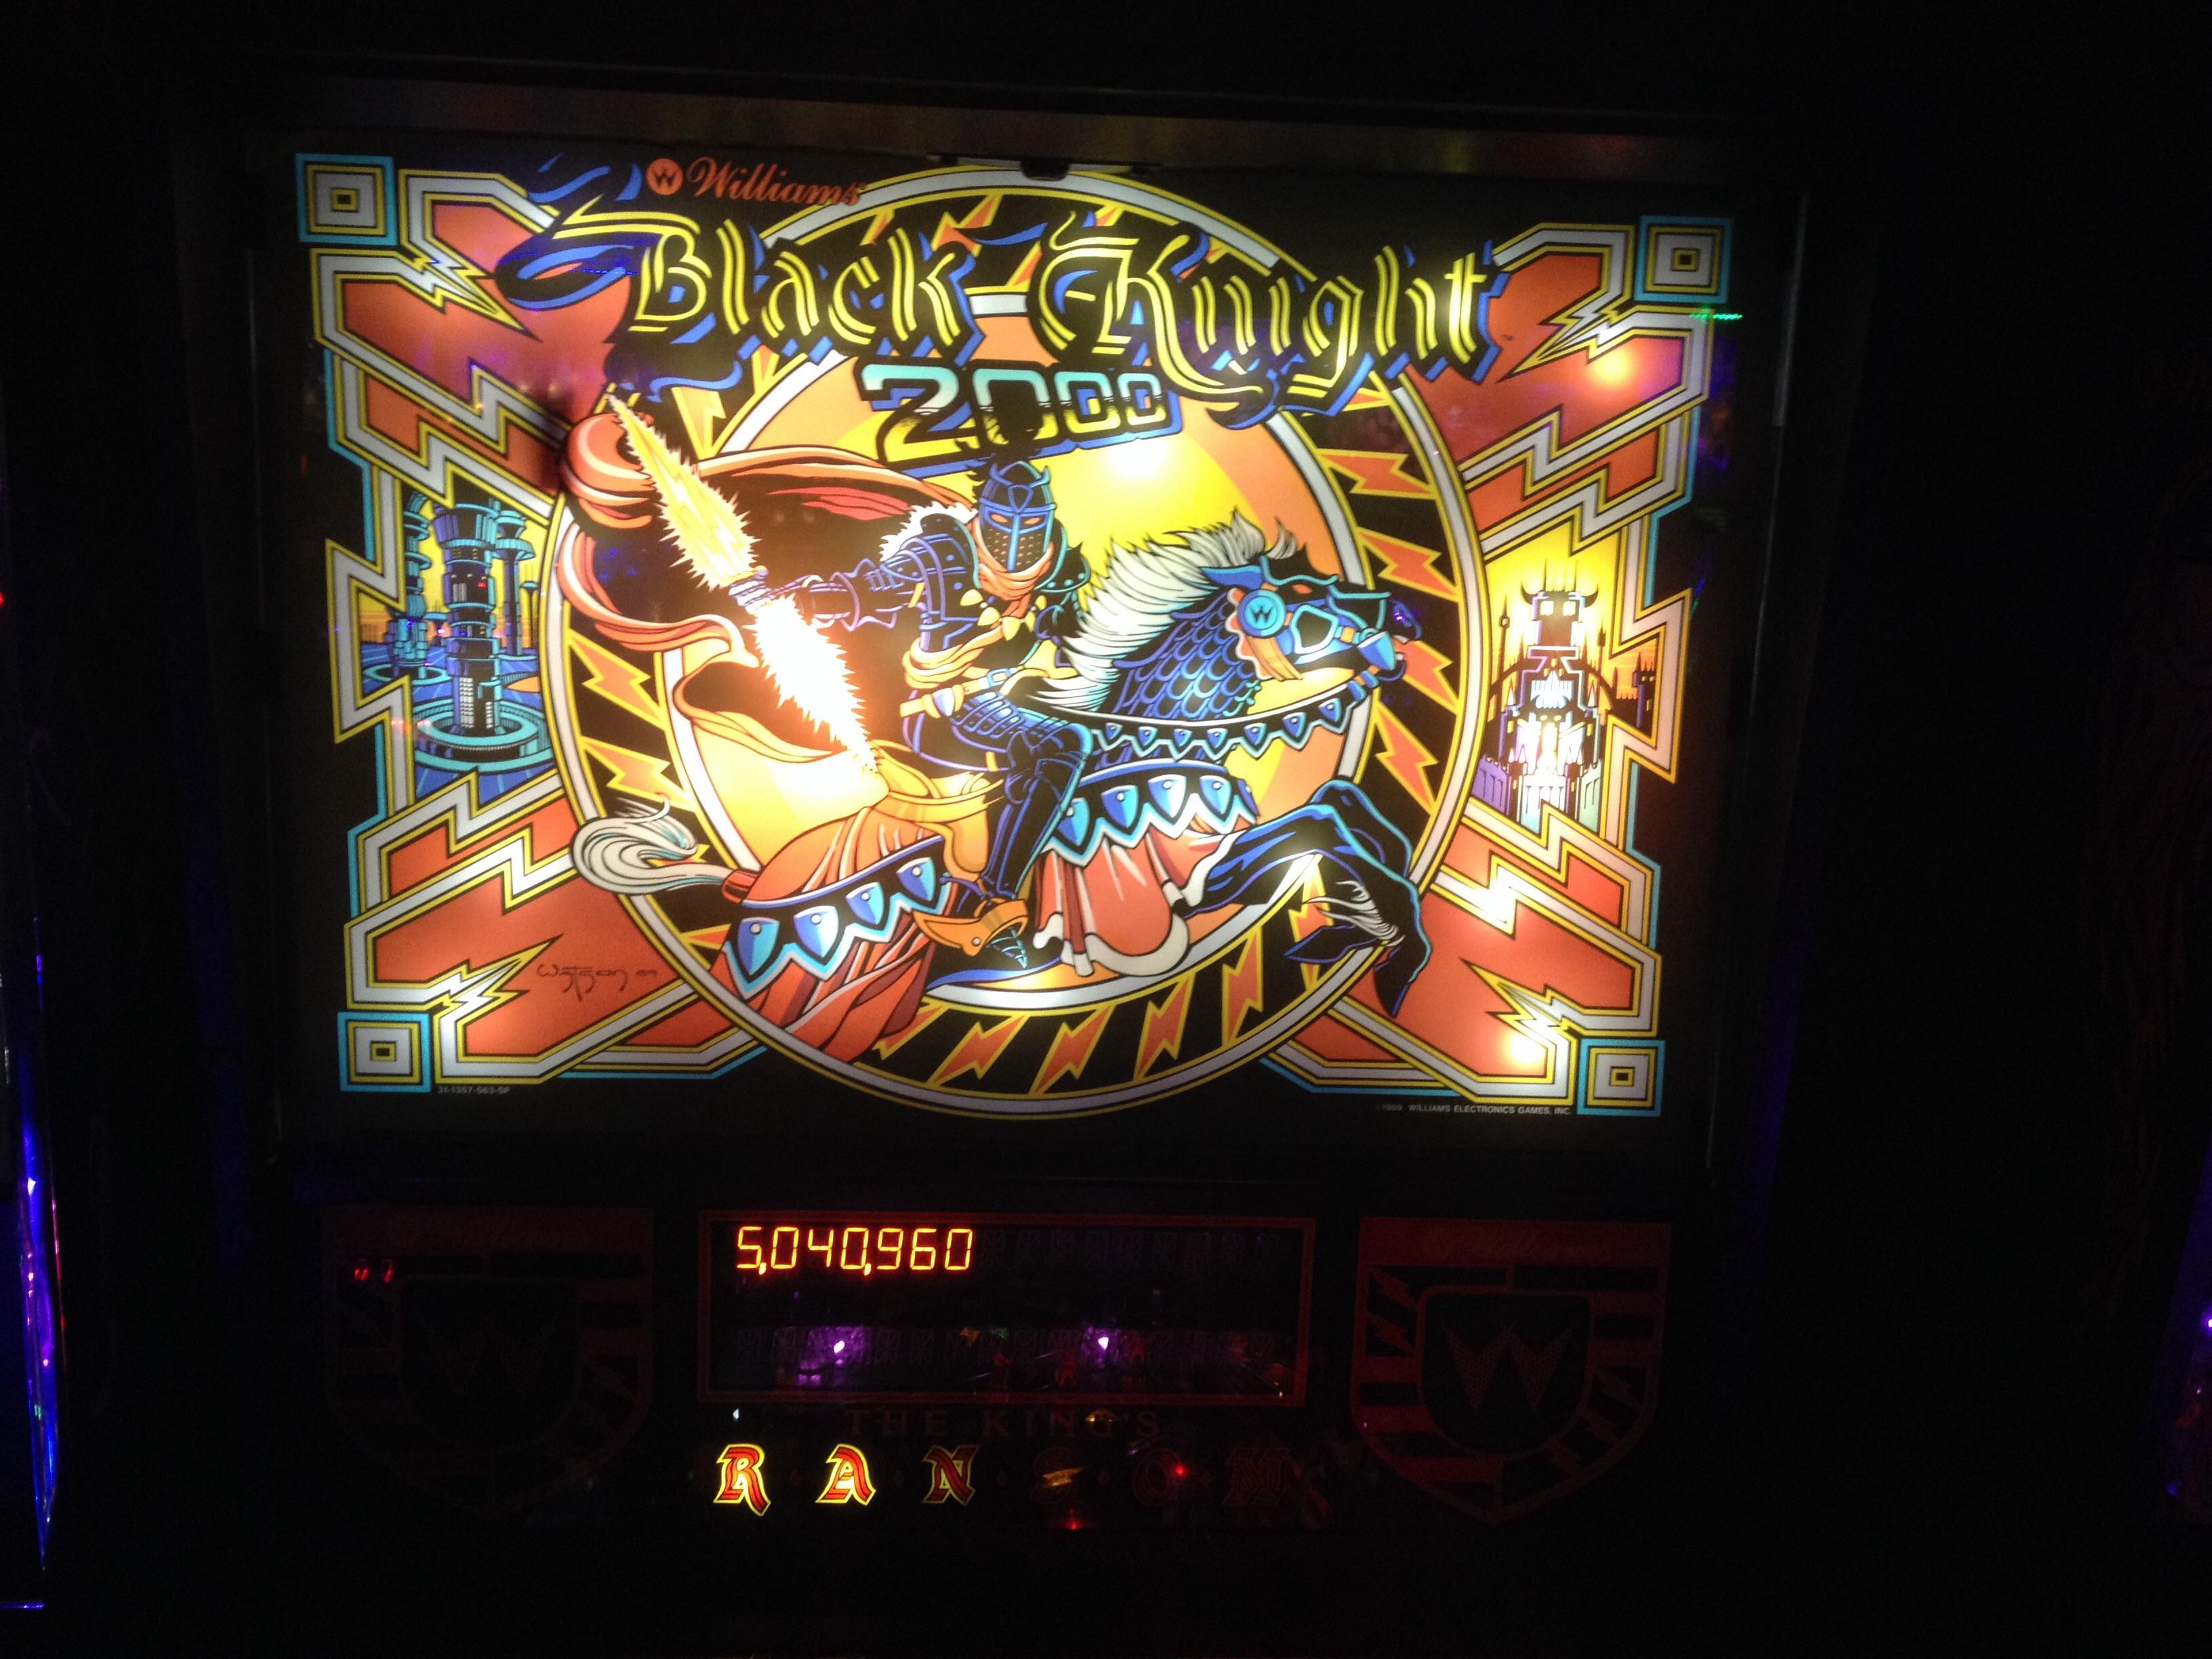 FosterAMF: Black Knight 2000 (Pinball: 3 Balls) 5,040,960 points on 2014-11-11 18:03:14